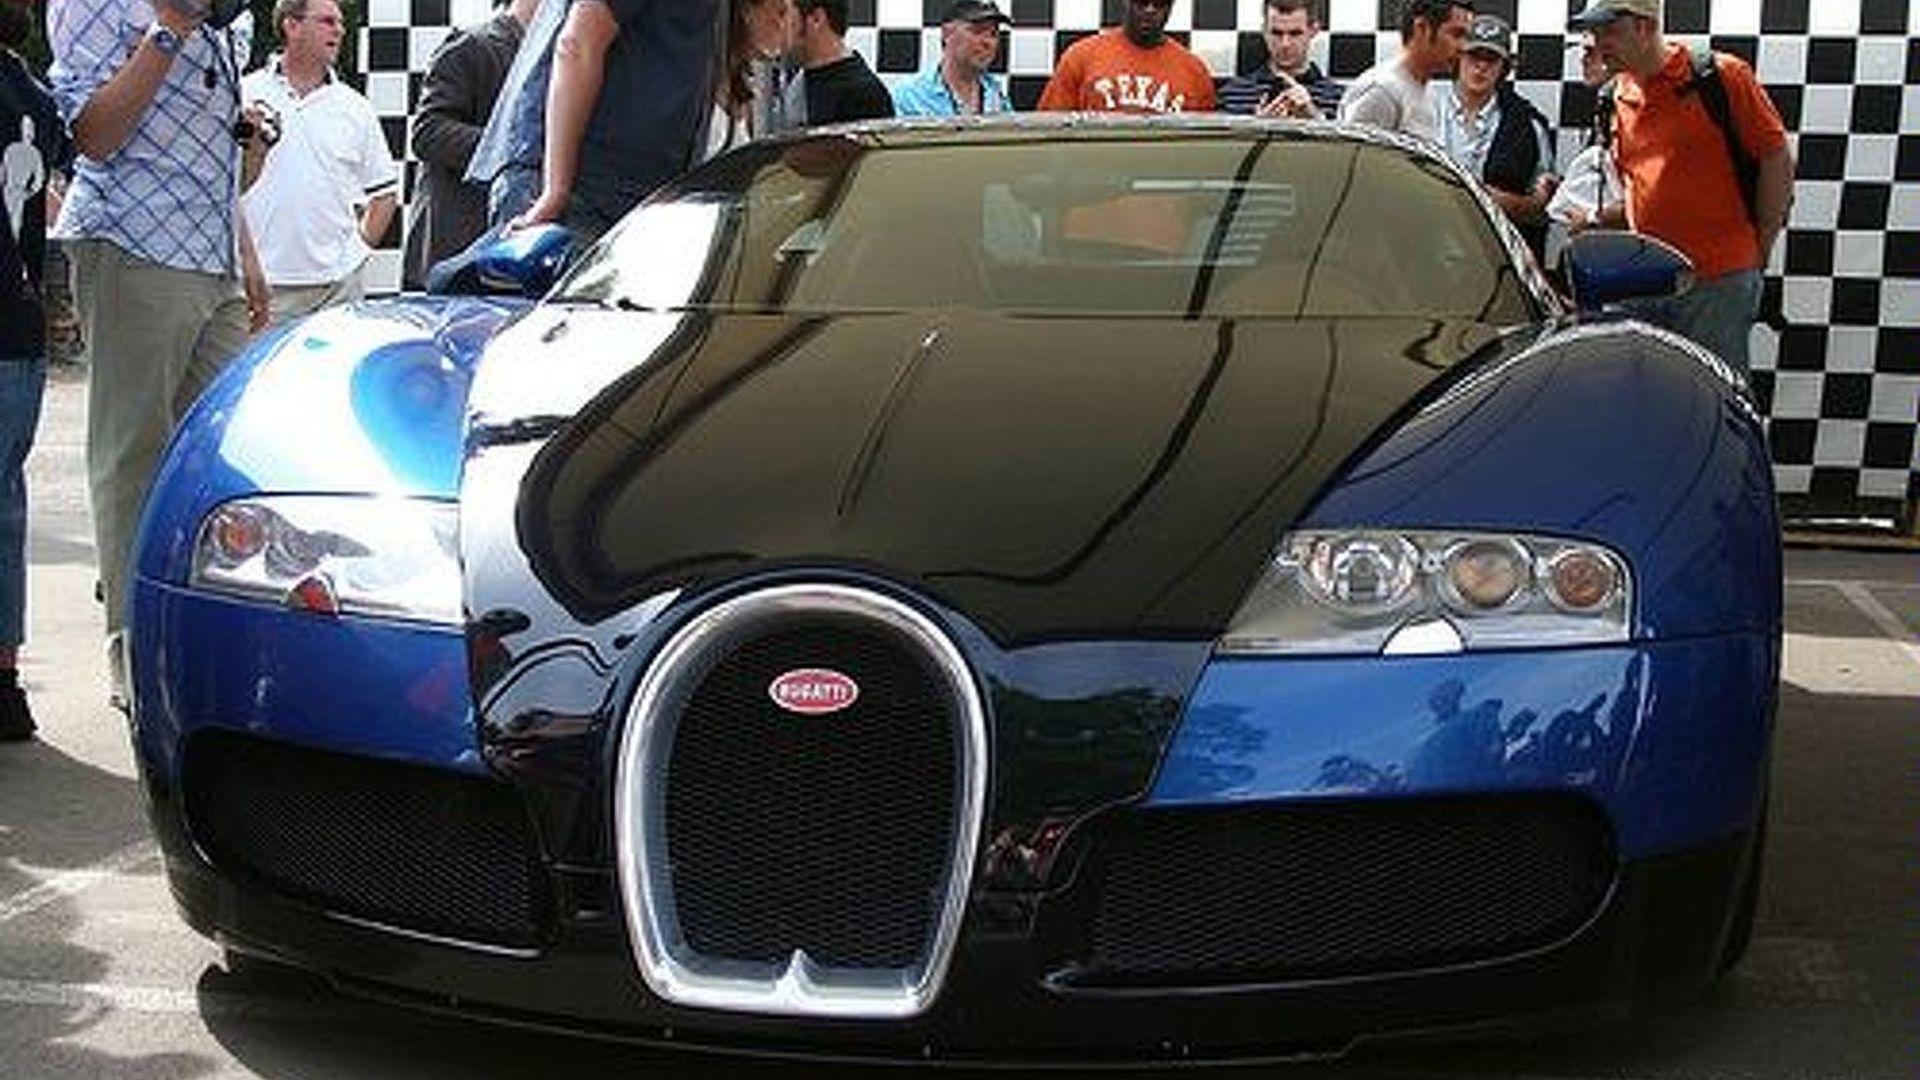 The First Crashed Bugatti Veyron on bugatti galibier, bugatti motorcycle, bugatti chrome, bugatti vitesse, bugatti type 57, bugatti veron, bugatti suv, bugatti coloring pages, bugatti z type, bugatti limousine, bugatti logo, bugatti adder, bugatti chiron, bugatti truck, bugatti eb110, bugatti speed, bugatti venom, bugatti 4 door, bugatti aventador, bugatti cars,